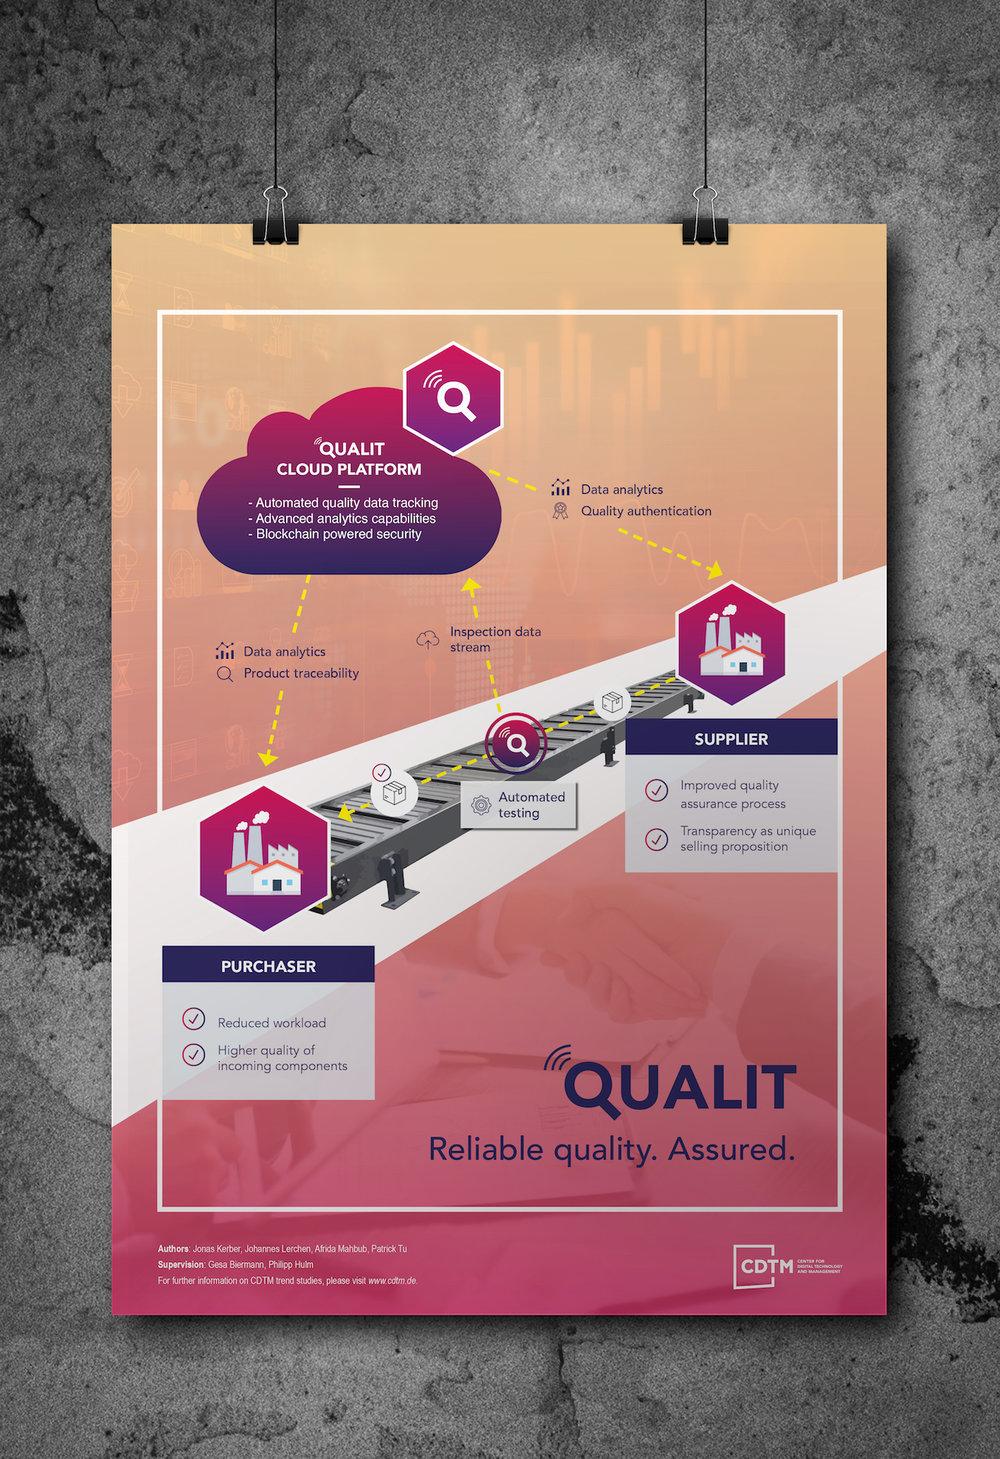 Qualit_Poster_mockup_web.jpg